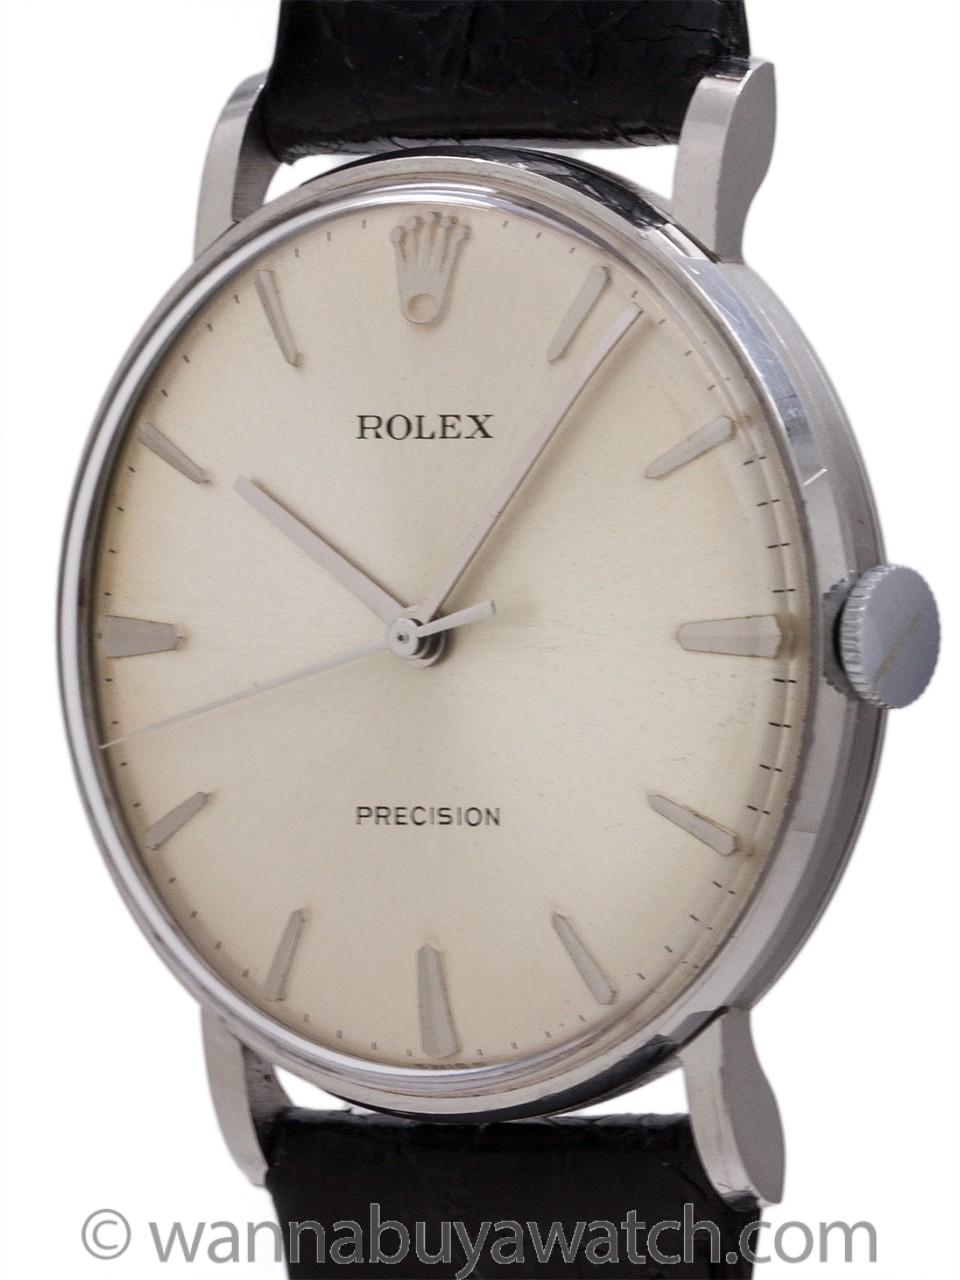 Rolex Precision Dress Model Stainless Steel circa 1960's